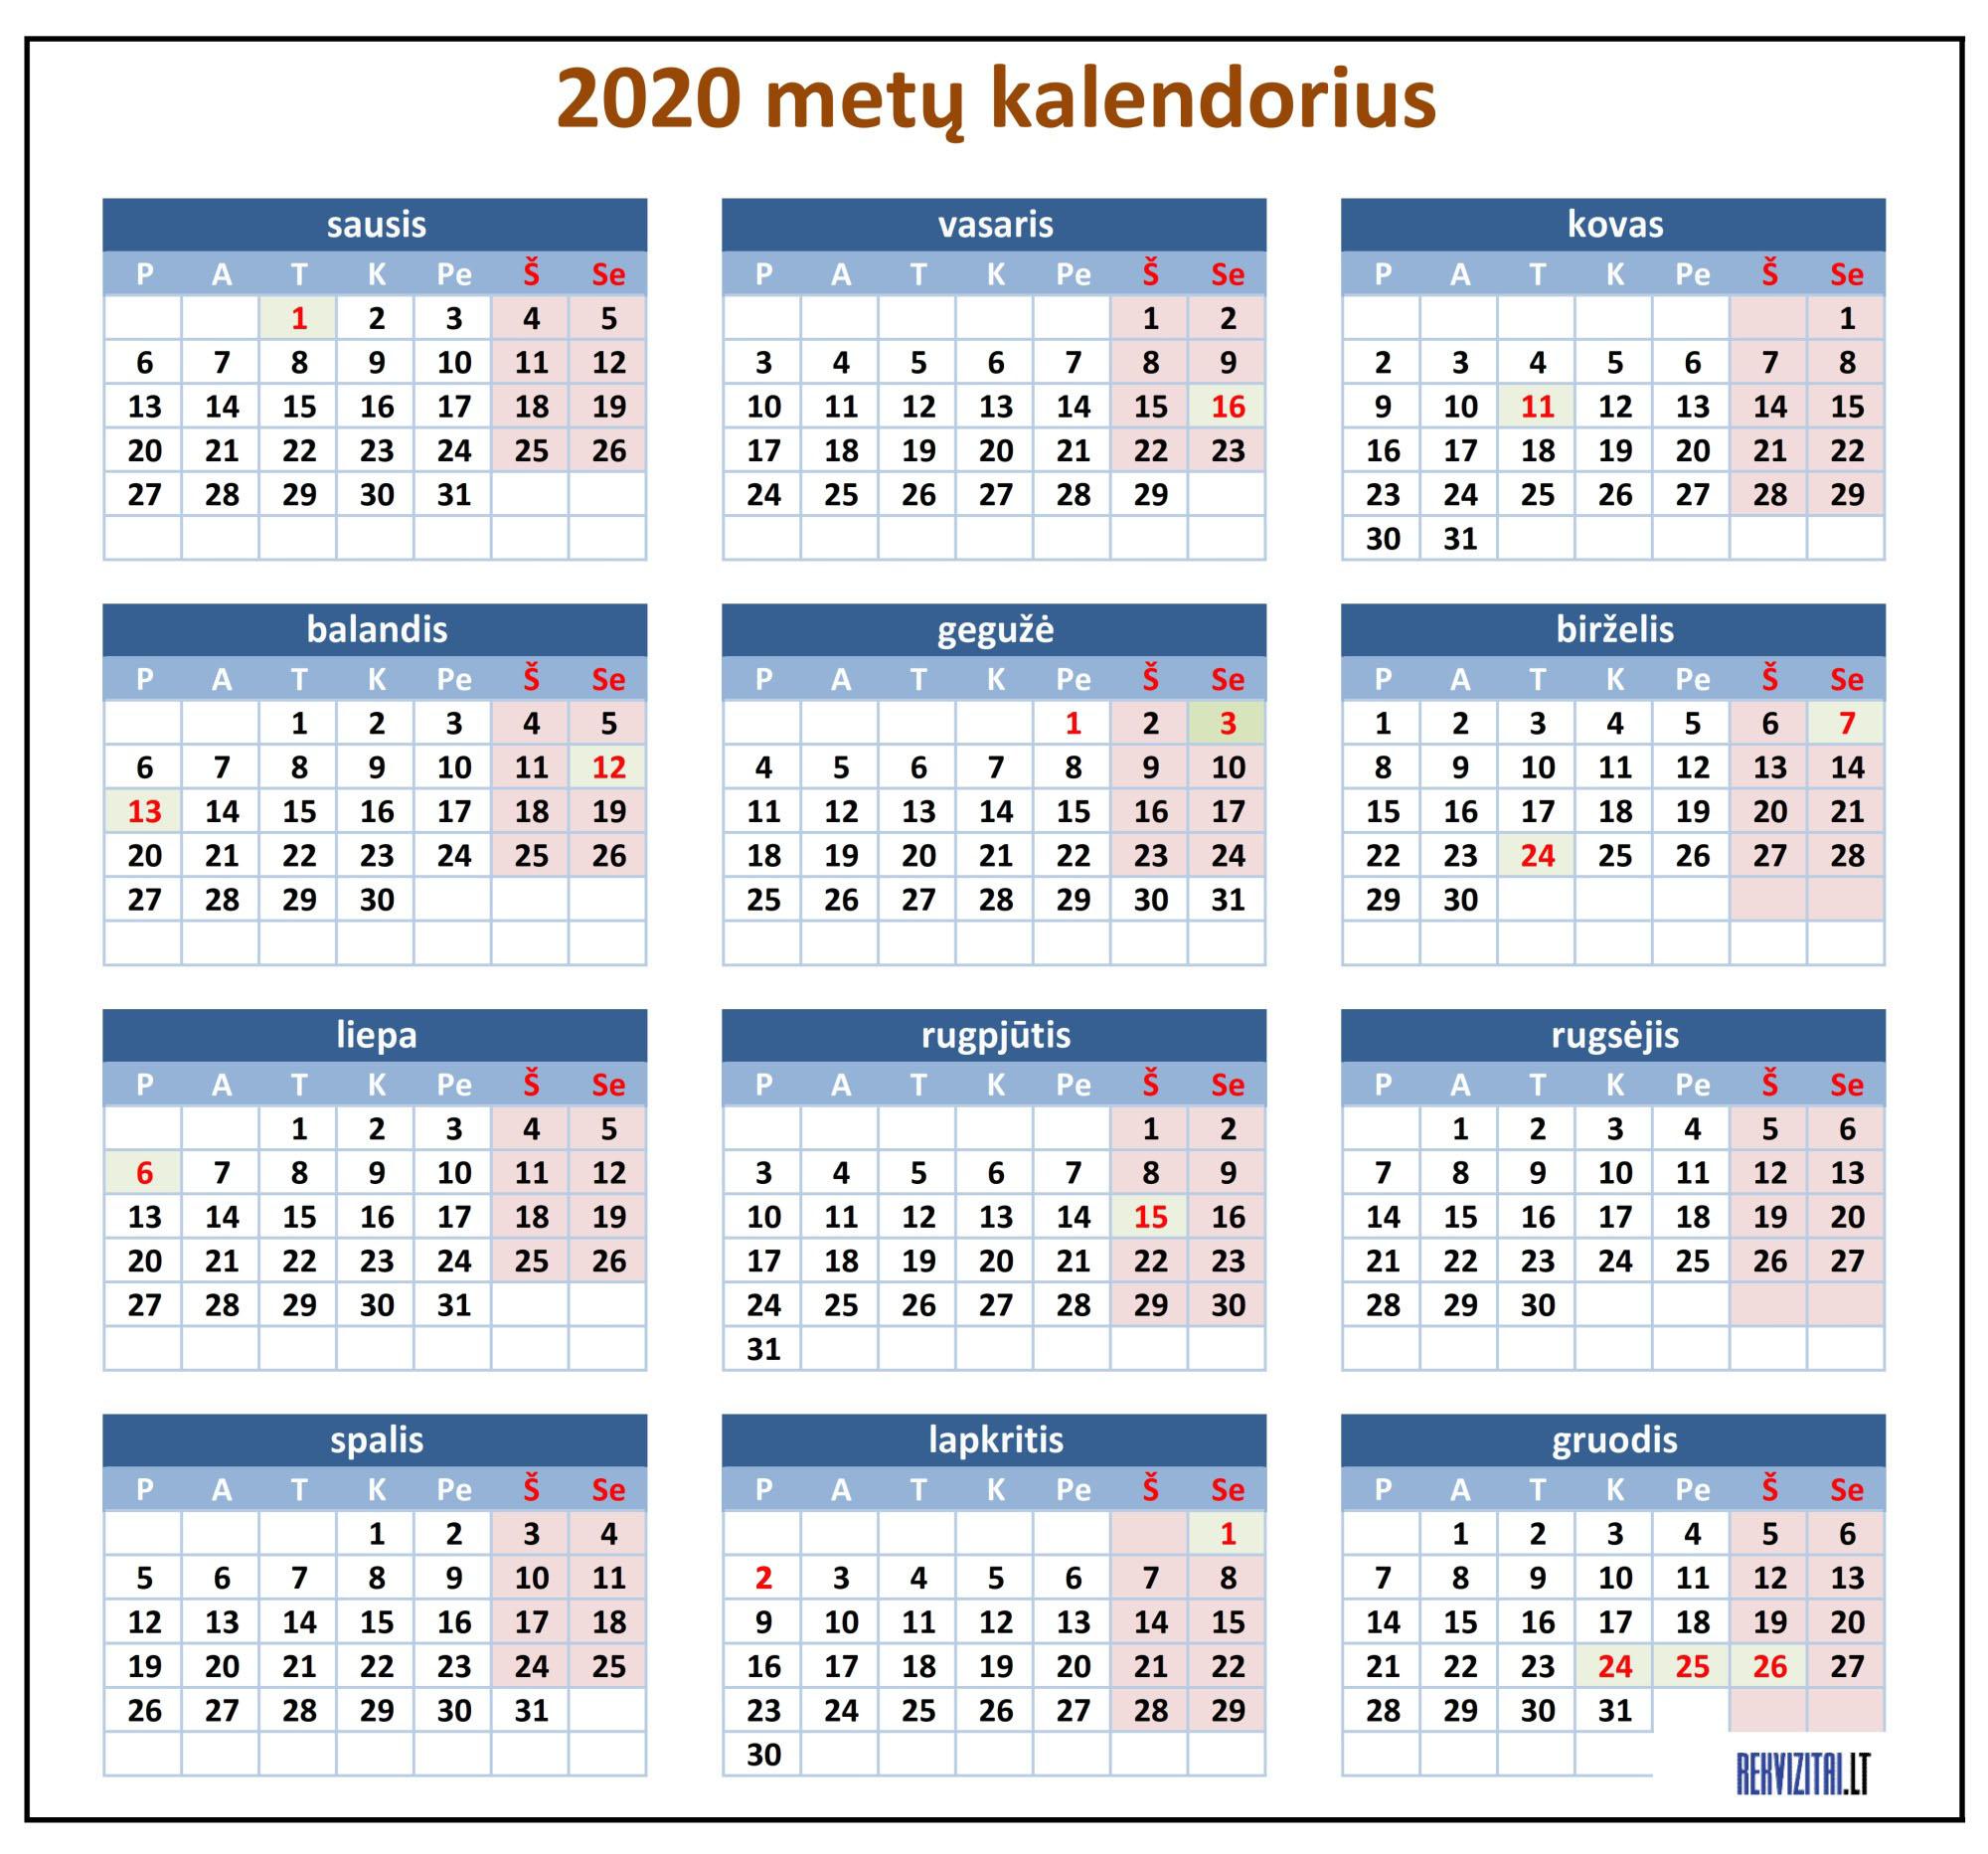 2020 Kalendorius.Kalendorius 2020 Iems Metams Rekvizitai Lt